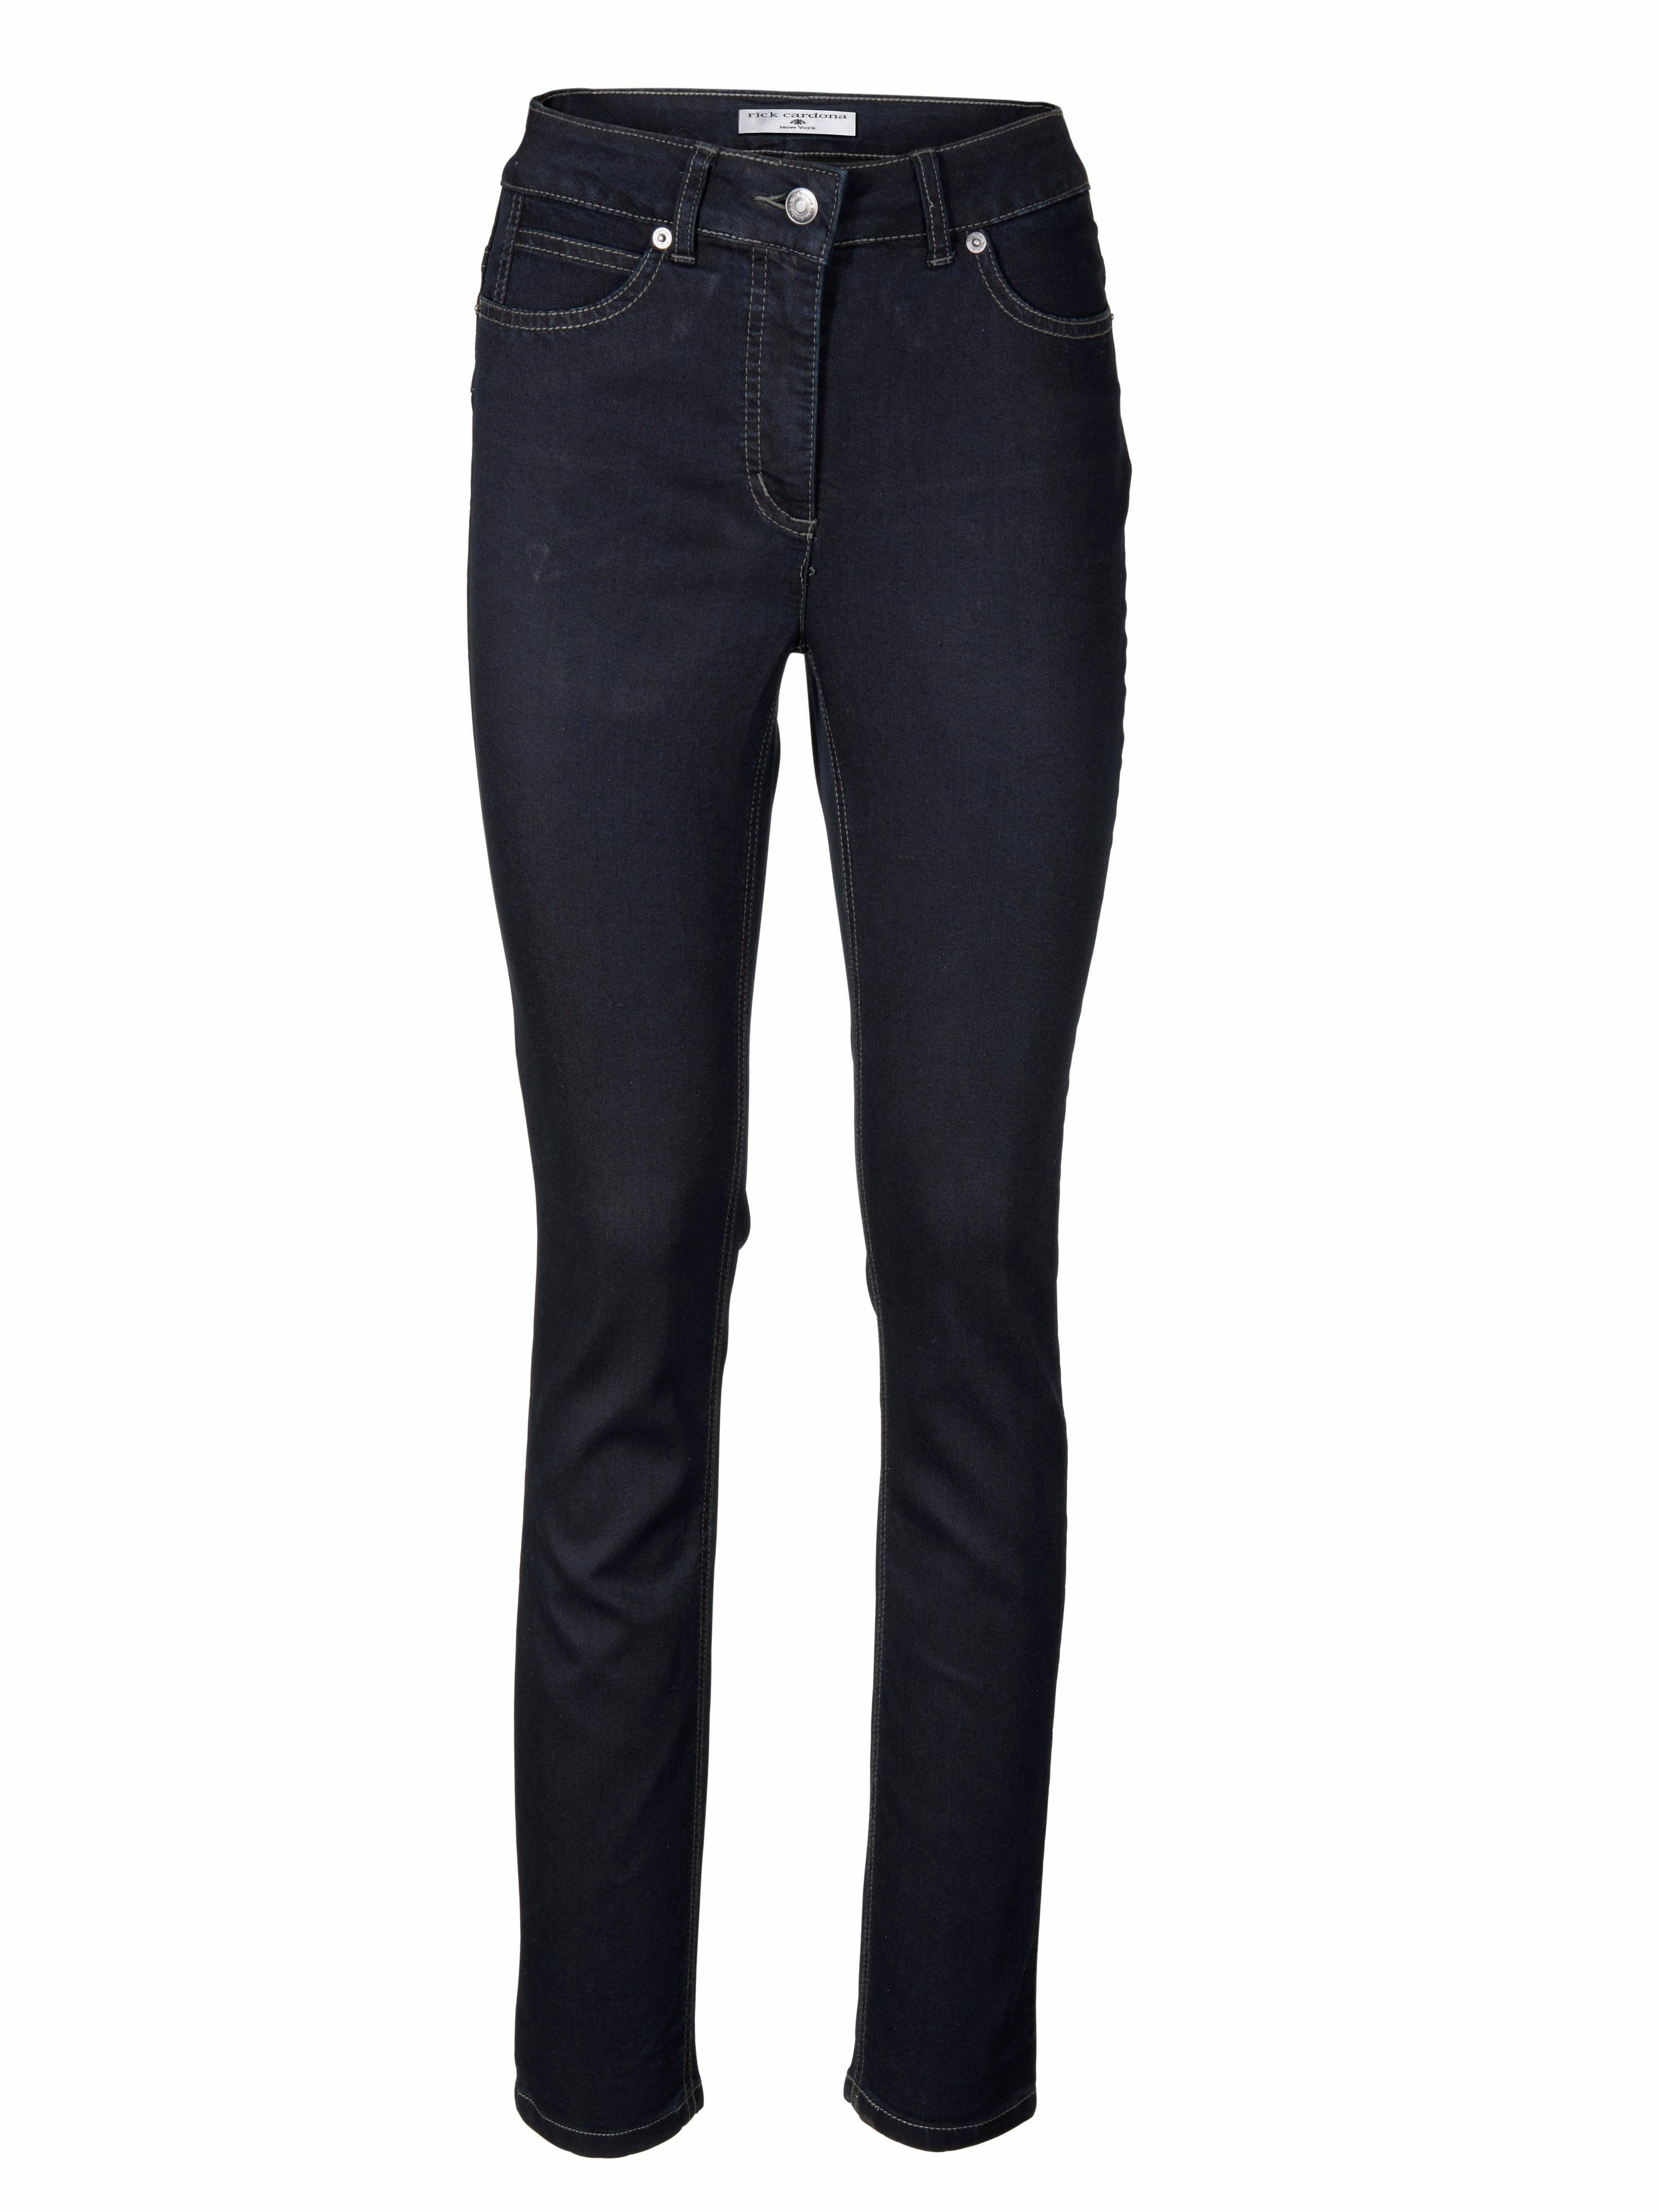 LINEA TESINI by Heine Corrigerende jeans - gratis ruilen op otto.nl